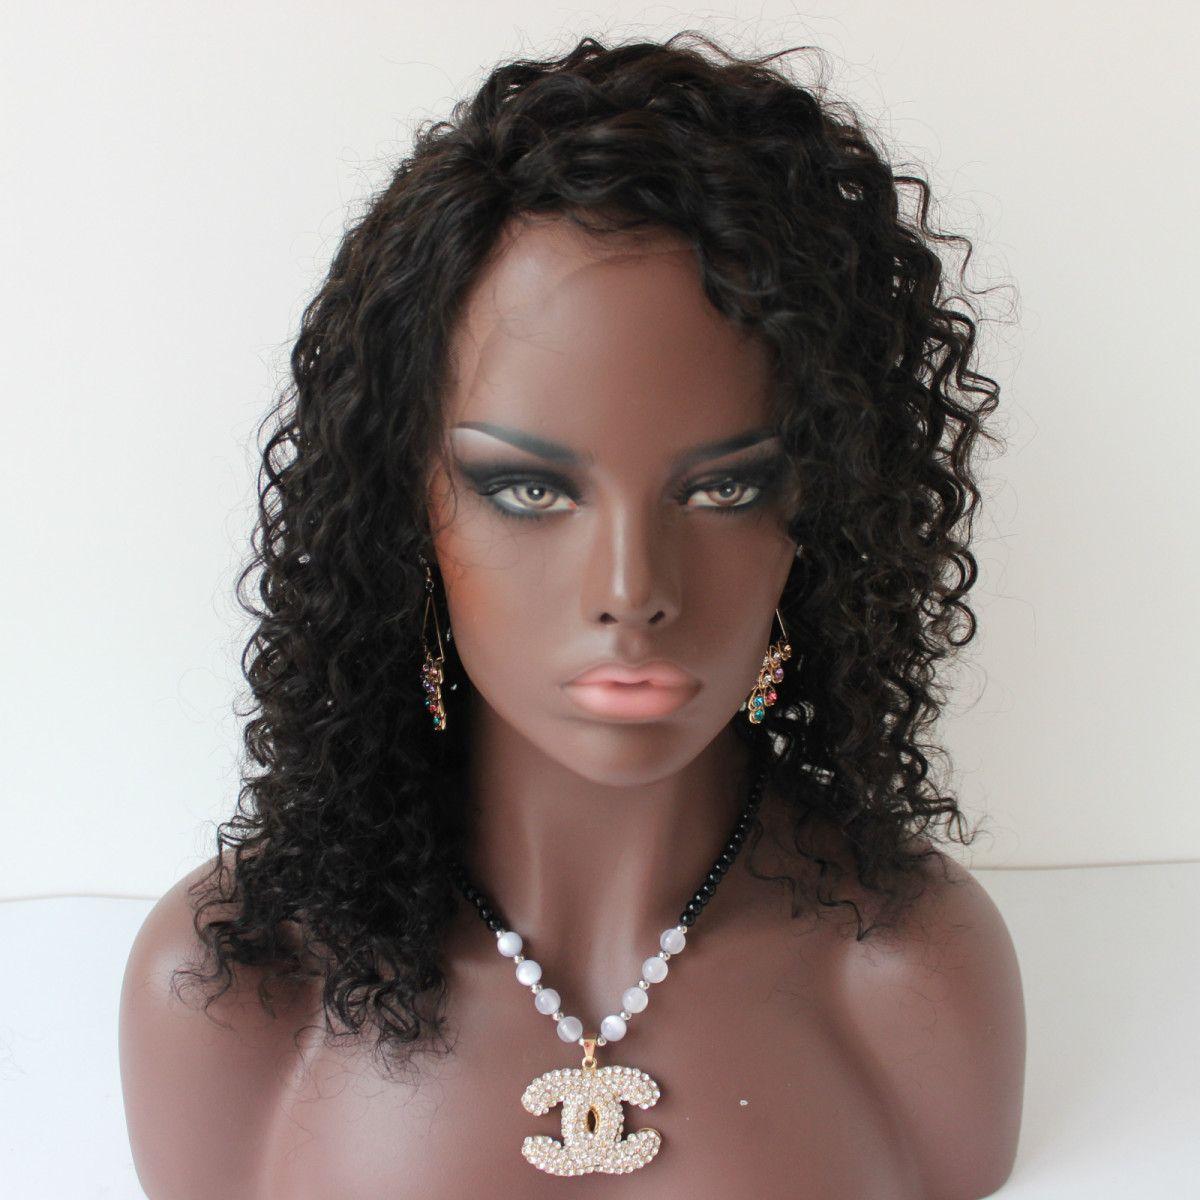 130 Density Peruvian Brazilian Full Lace Human Hair Wigs For Black Women Short Kinky Curly Lace Front Wig For Black Women